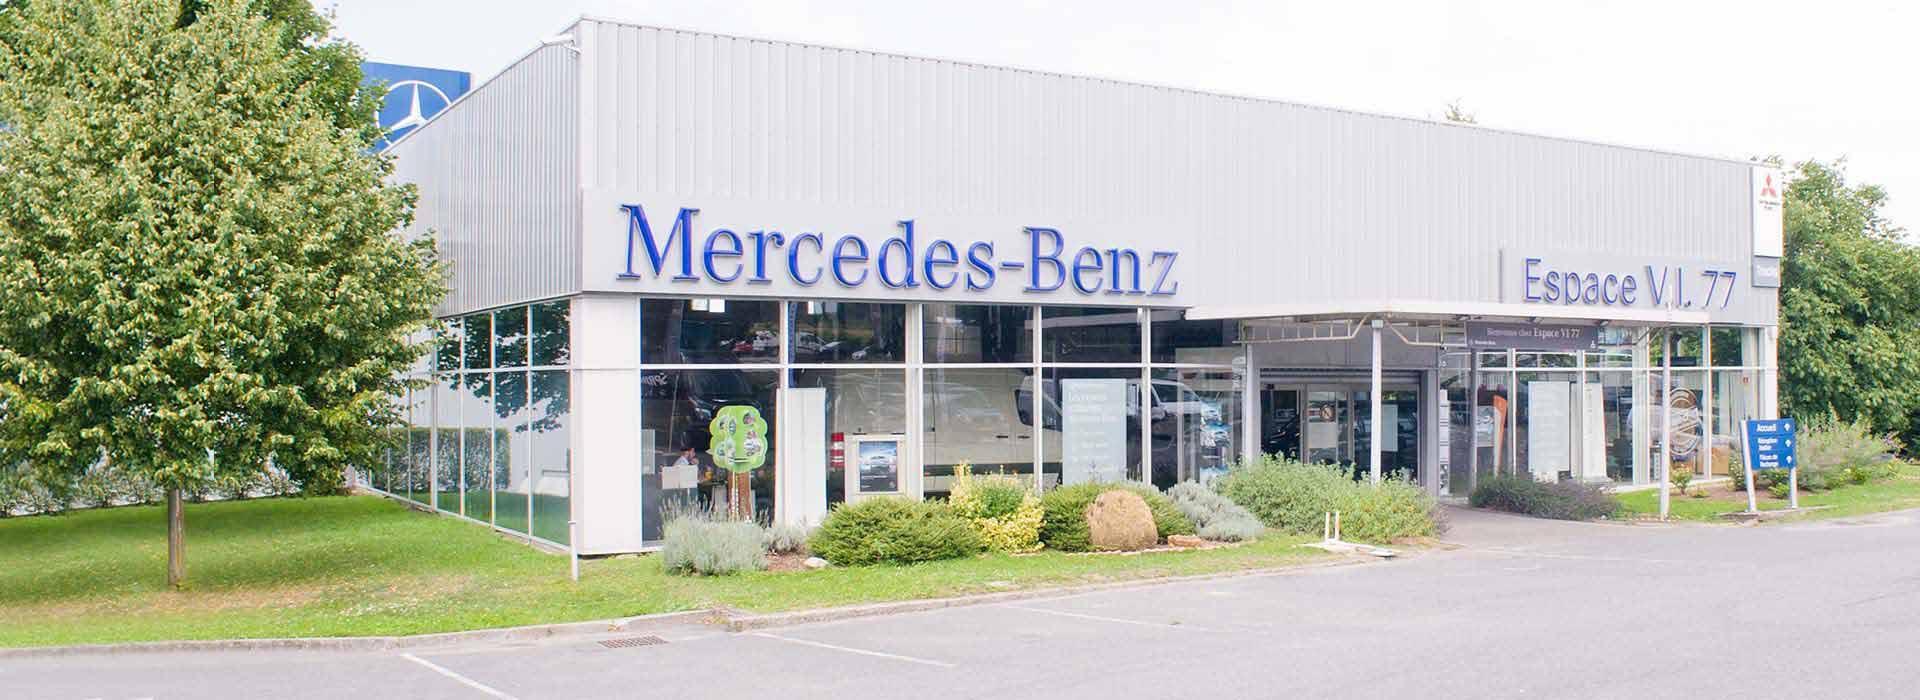 Mercedes benz utilitaires villeparisis concessionnaire for Garage mercedes villeparisis